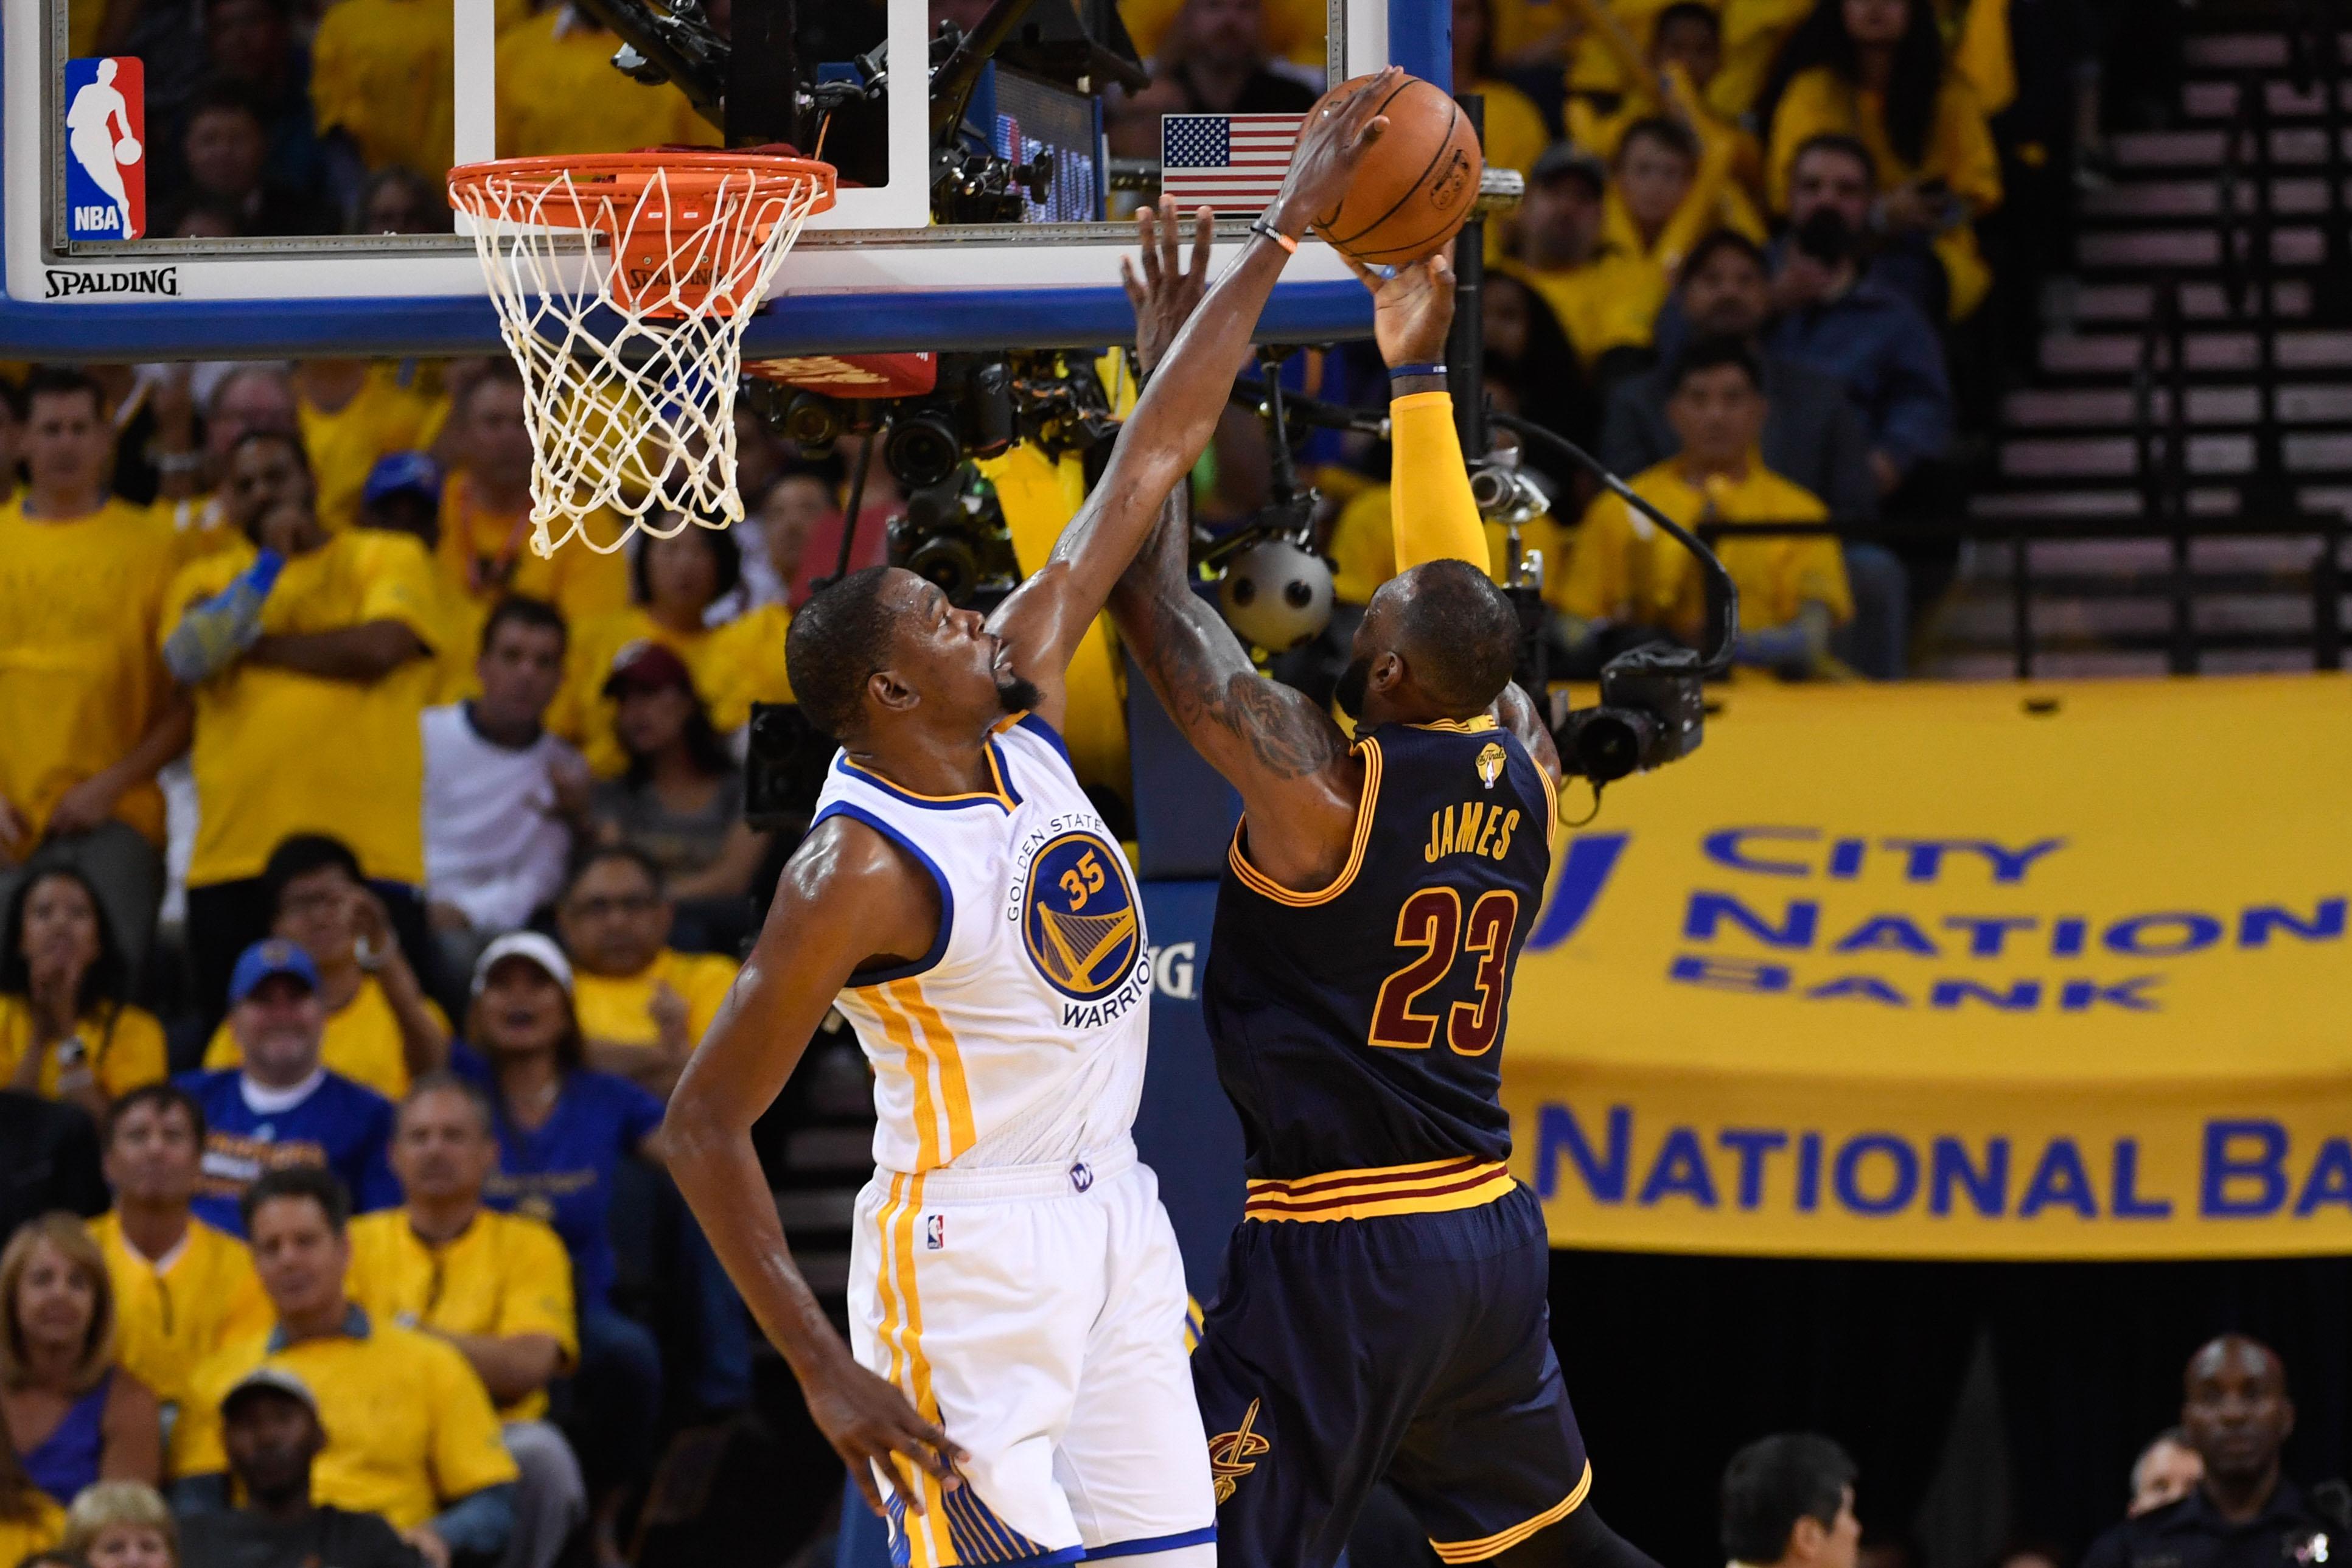 LeBron James' NBA Finals deja vu: Game 2 means everything now